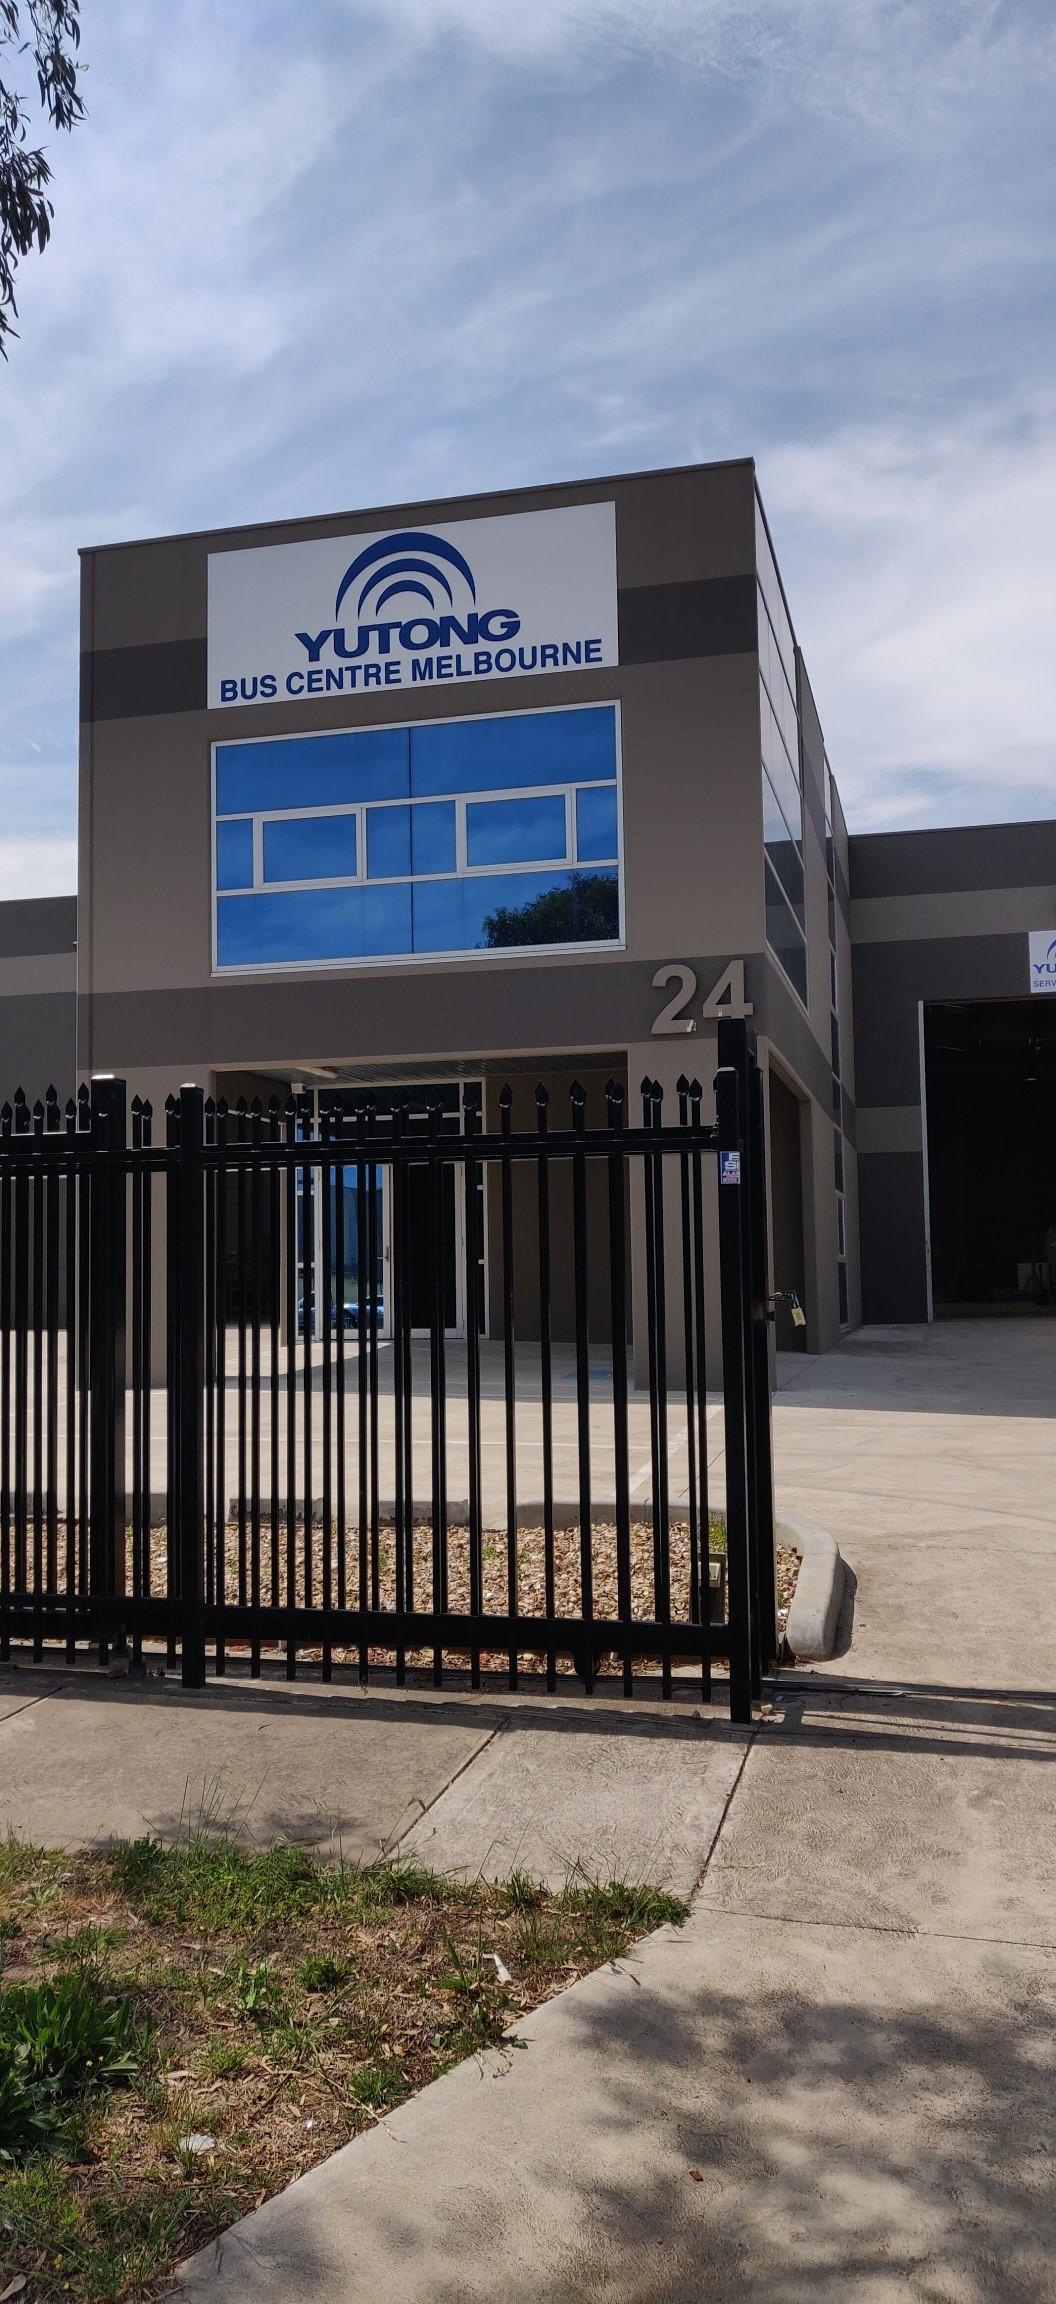 Yutong Bus Centre Melbourne